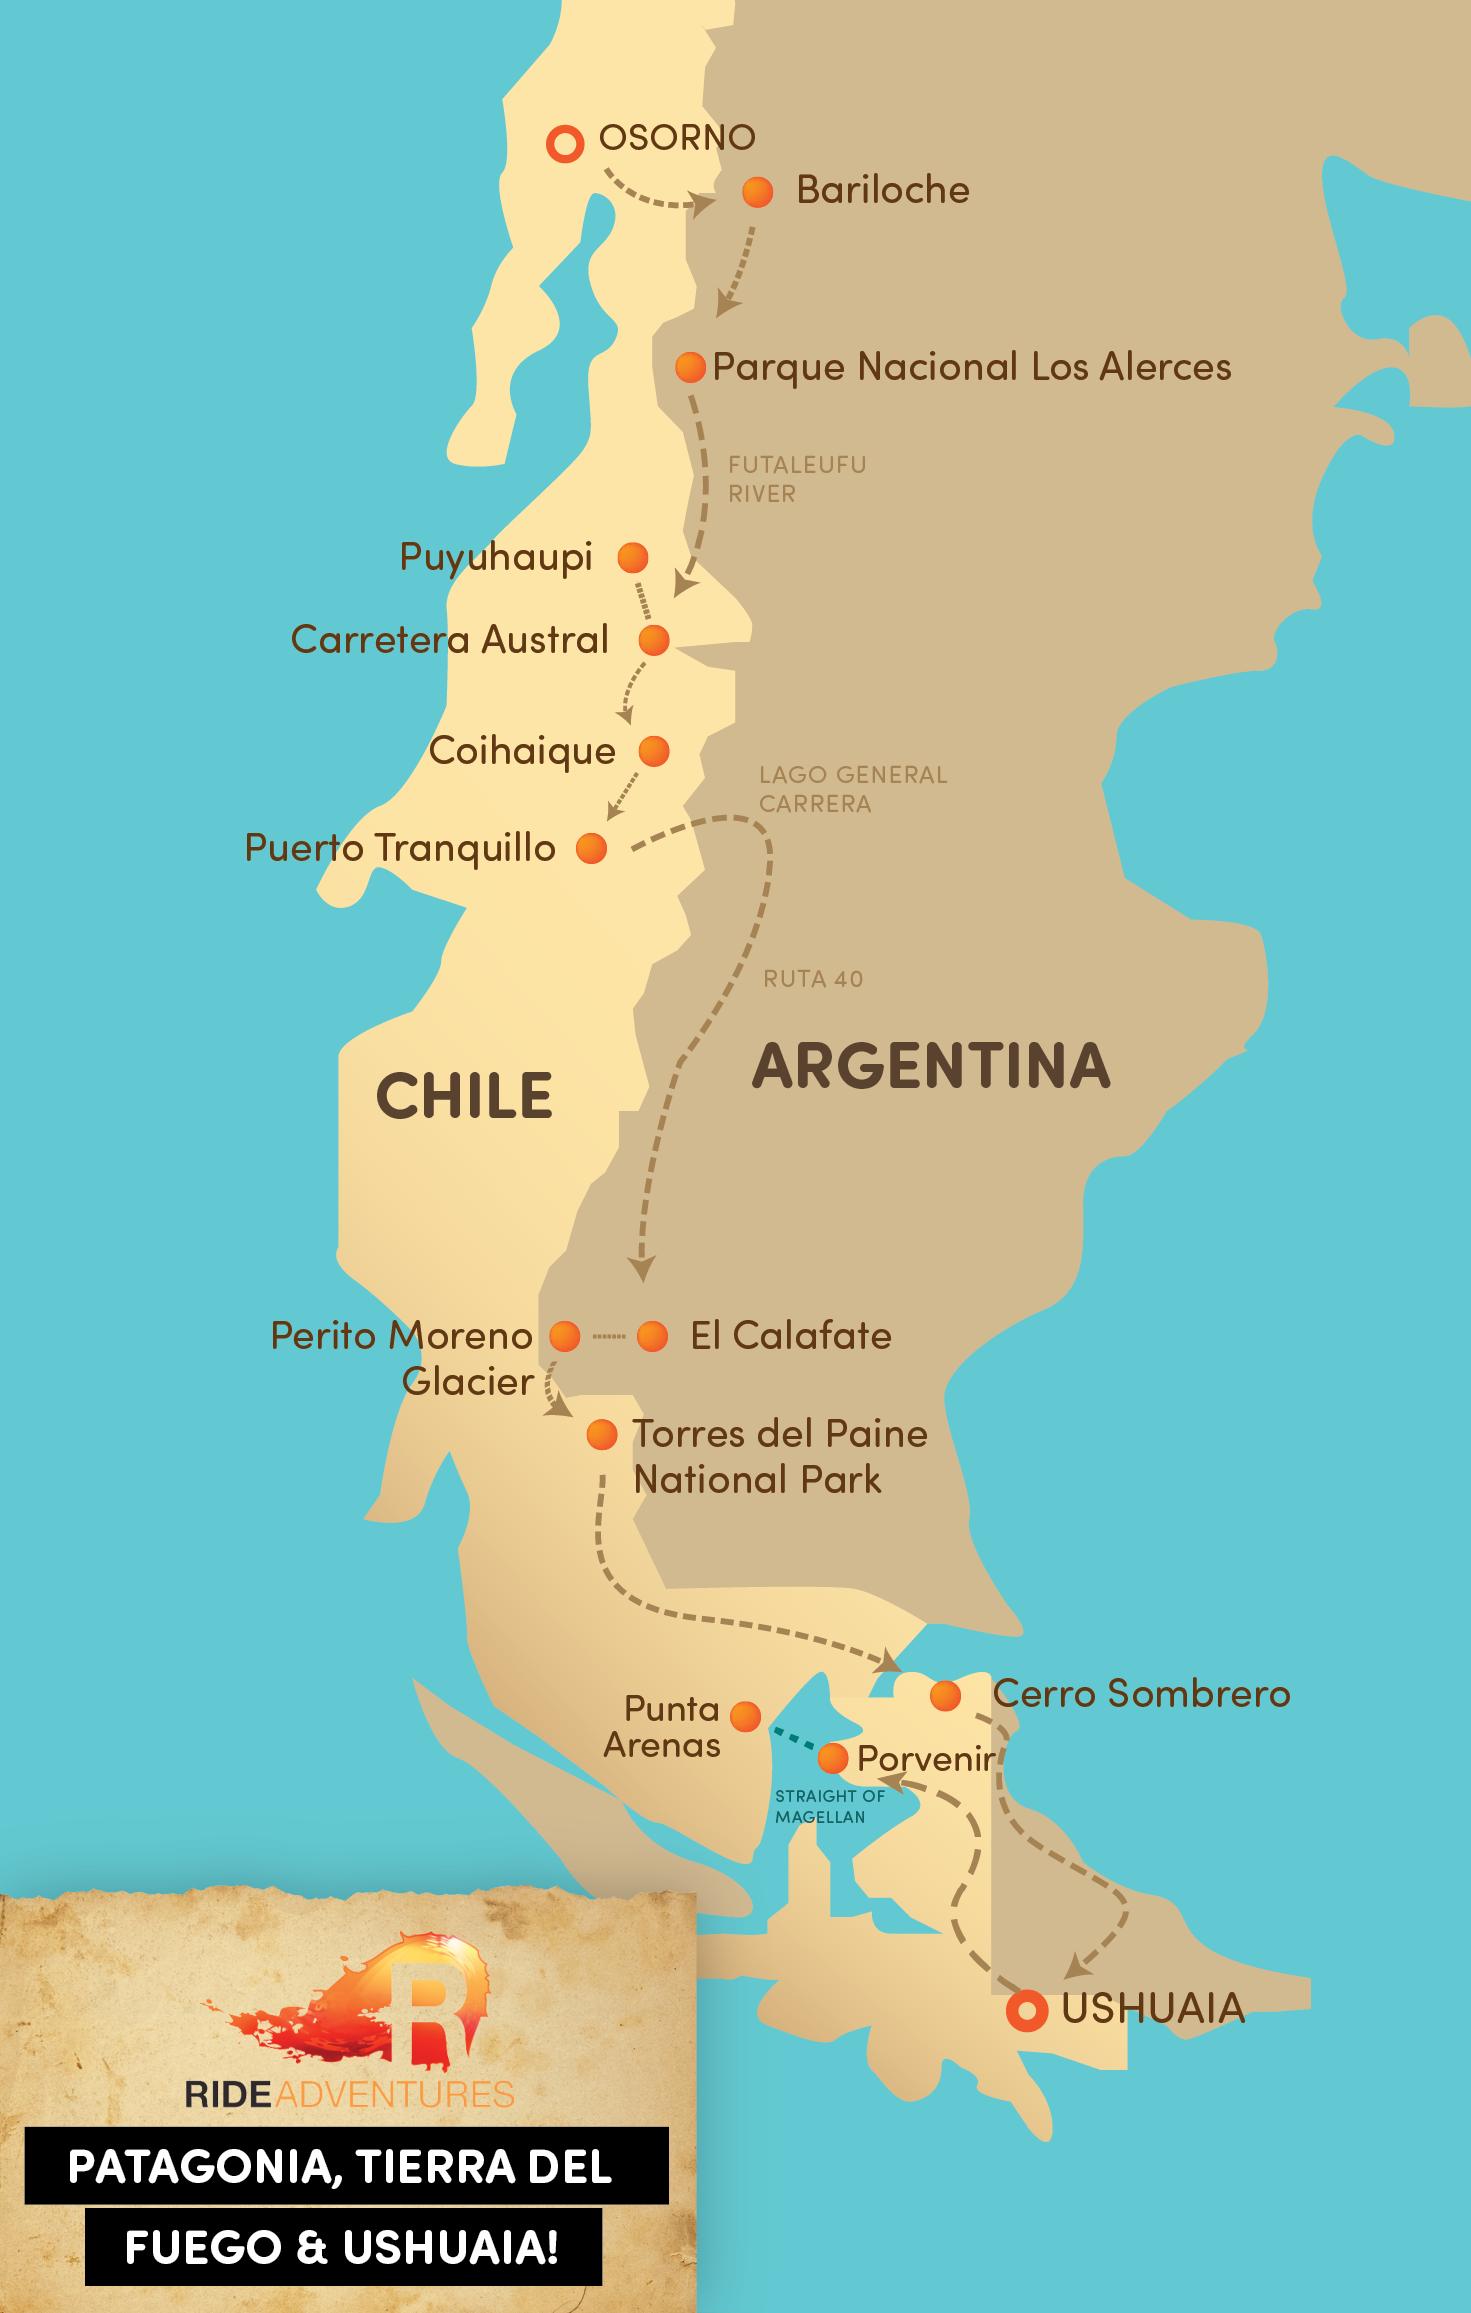 Motorcycle Touring BMWs Patagonia Tierra Del Fuego Ushuaia - Argentina map ushuaia